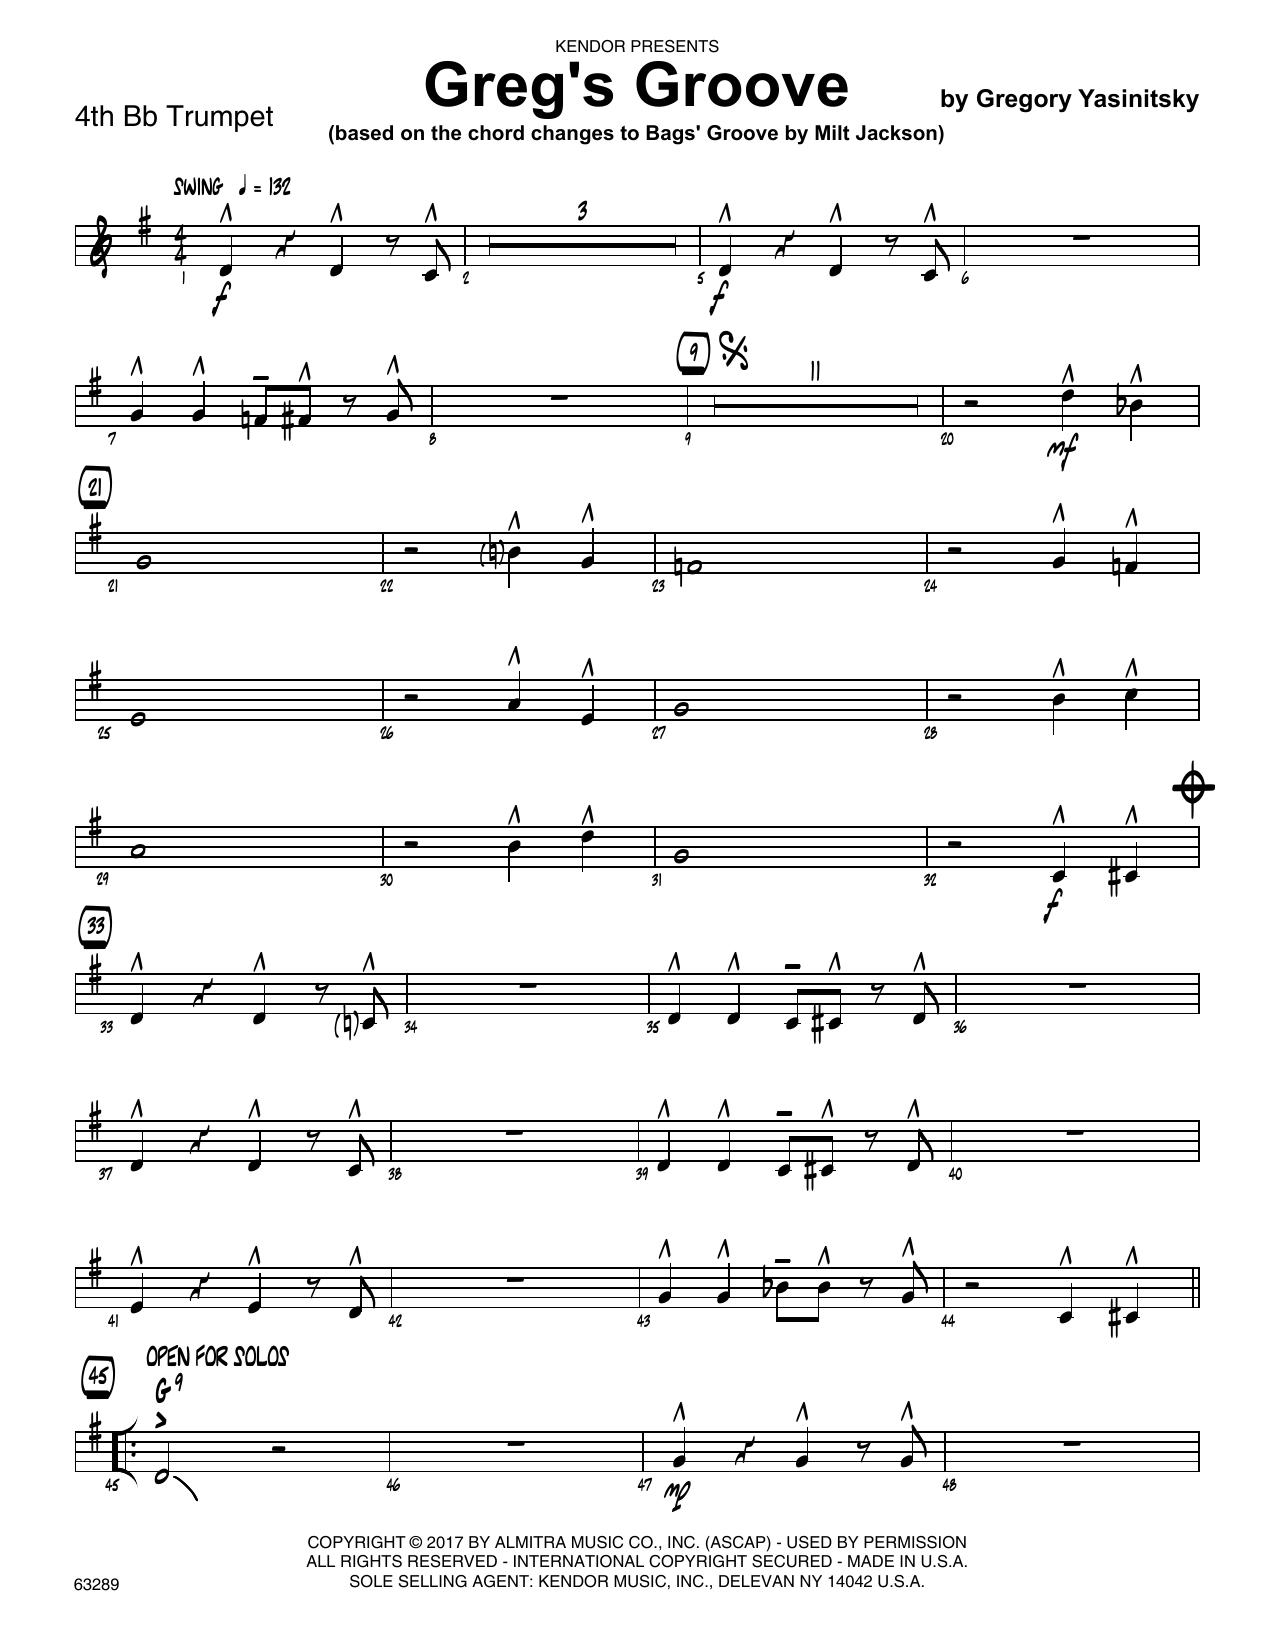 Greg's Groove - 4th Bb Trumpet Sheet Music